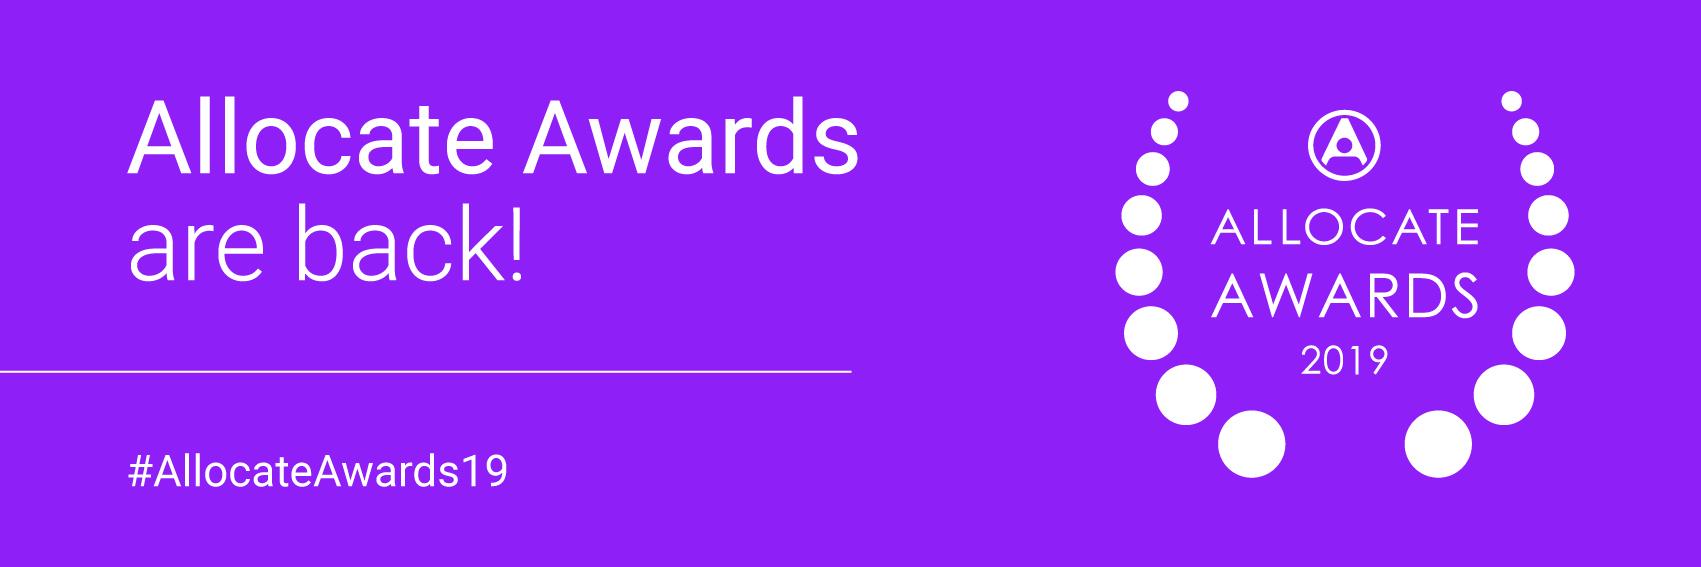 Allocate Awards 2019 Shortlist Announced